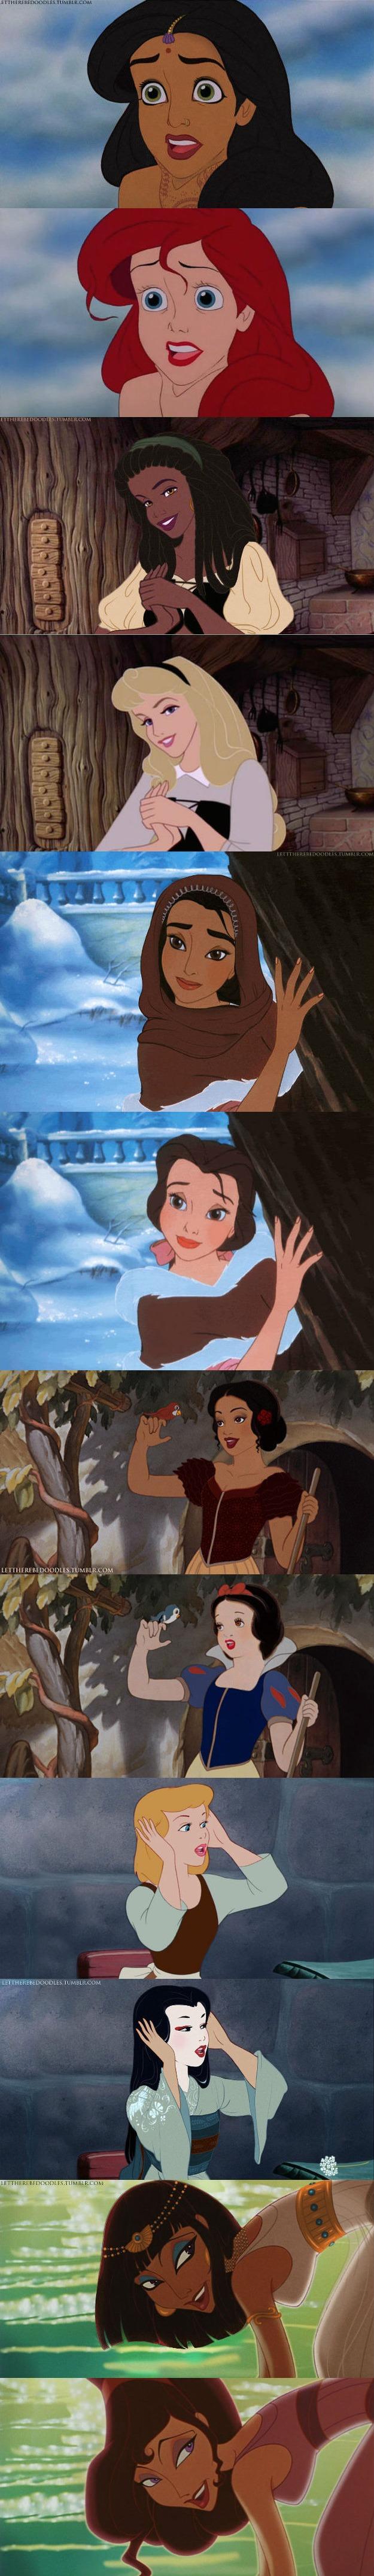 Disney Princess with different ethnic